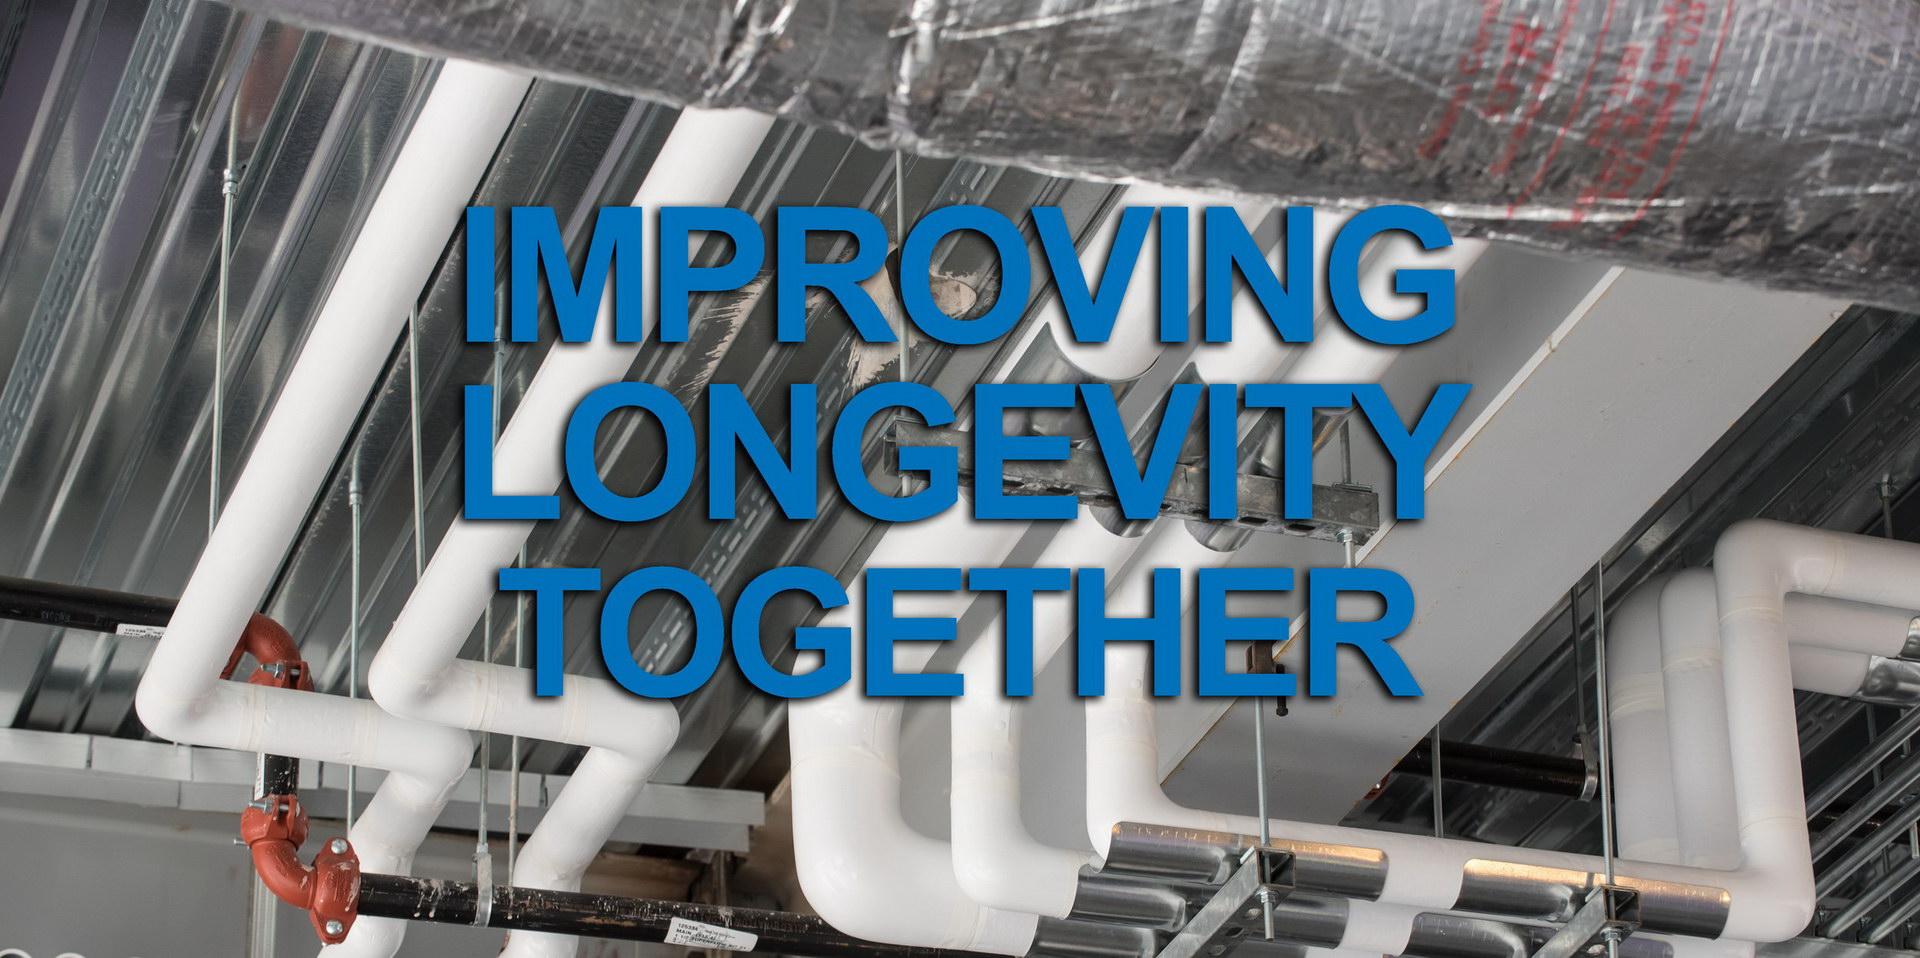 api-distribution-improving-longevity-together